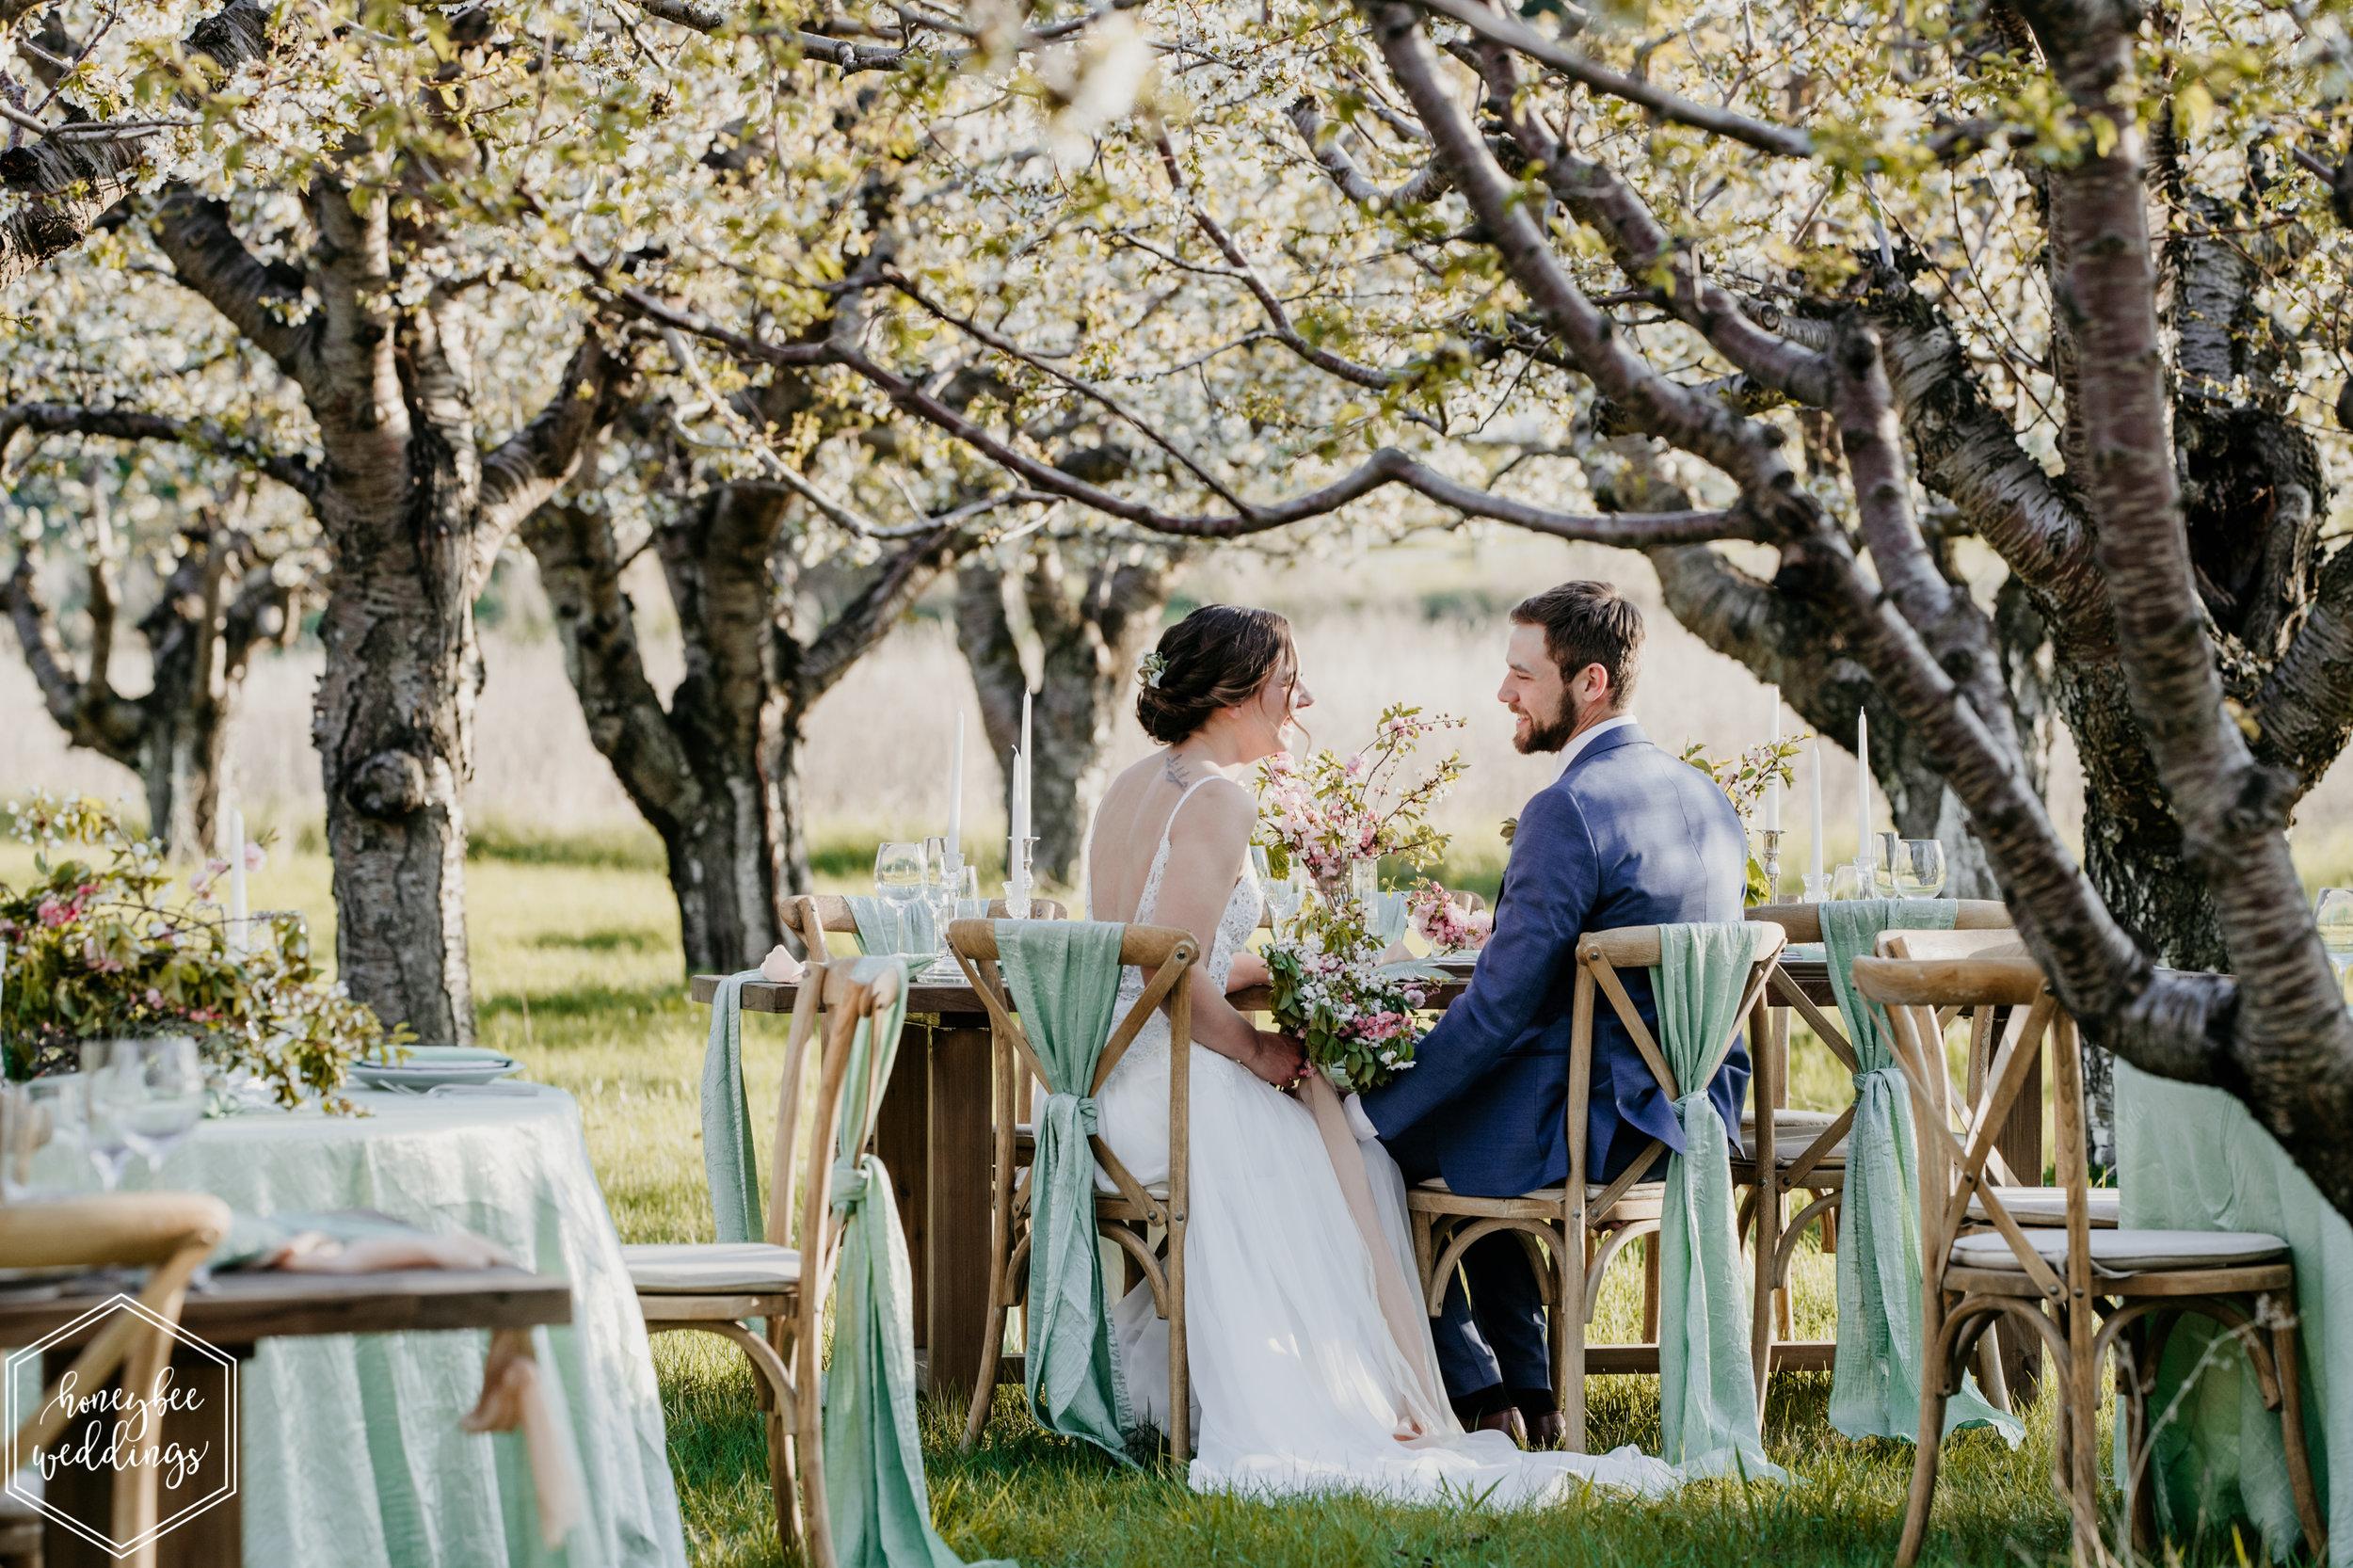 141Cherry Blossom Wedding_Styled Photoshoot_Honeybee Weddings_May 11, 2019-634.jpg